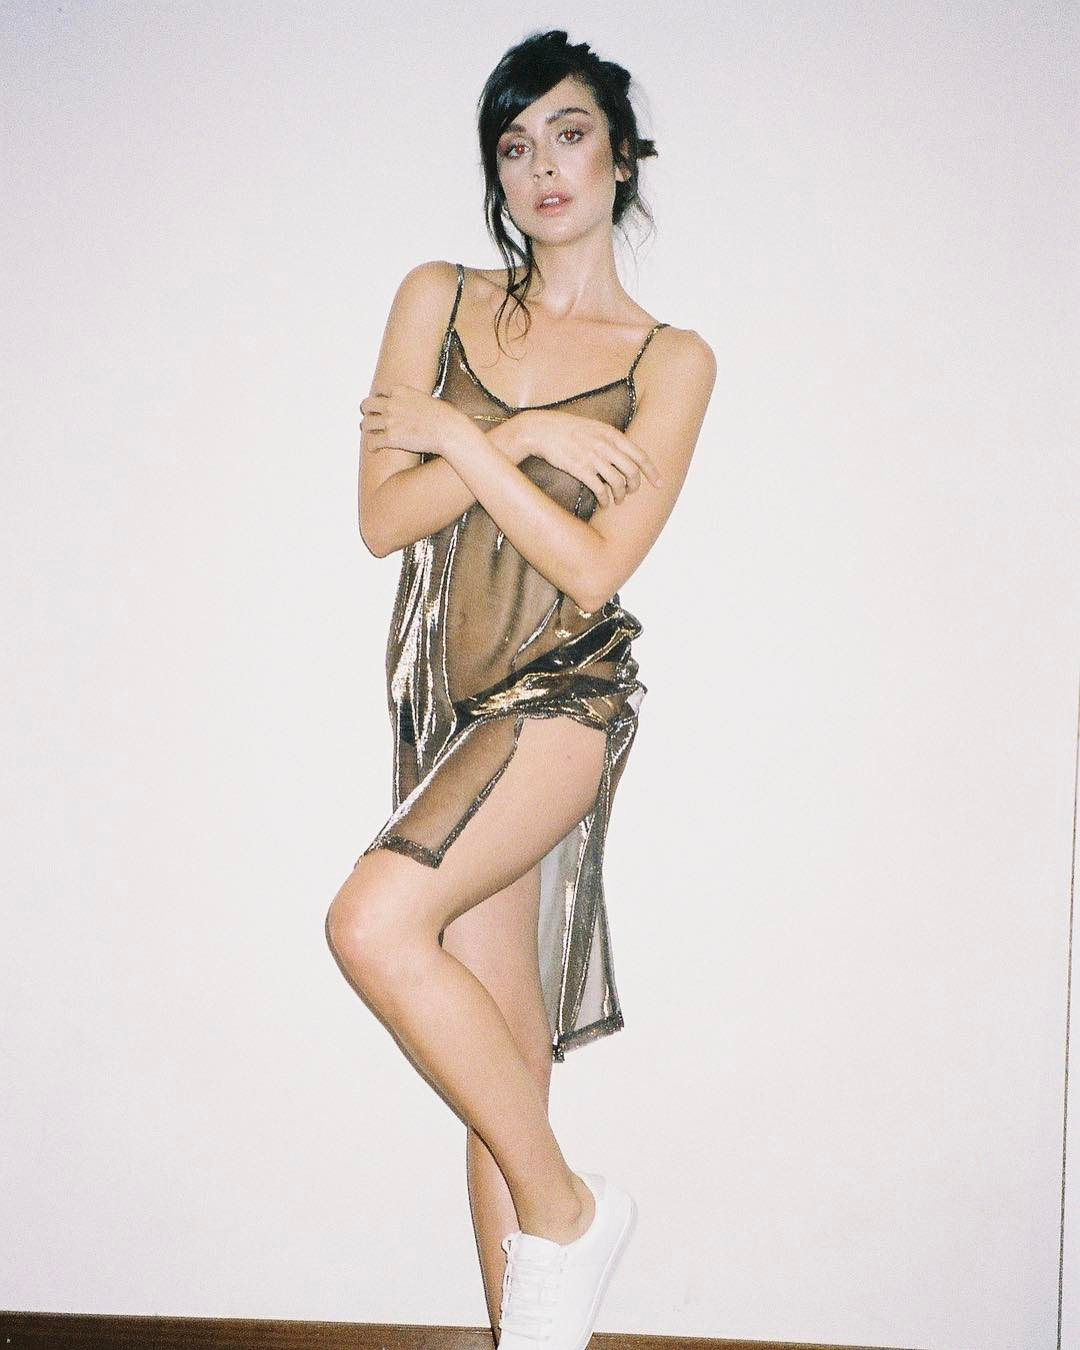 film-claudia-bouza-marc-makeup-soler-sara-nude-lopera-leandro-crespi.jpg